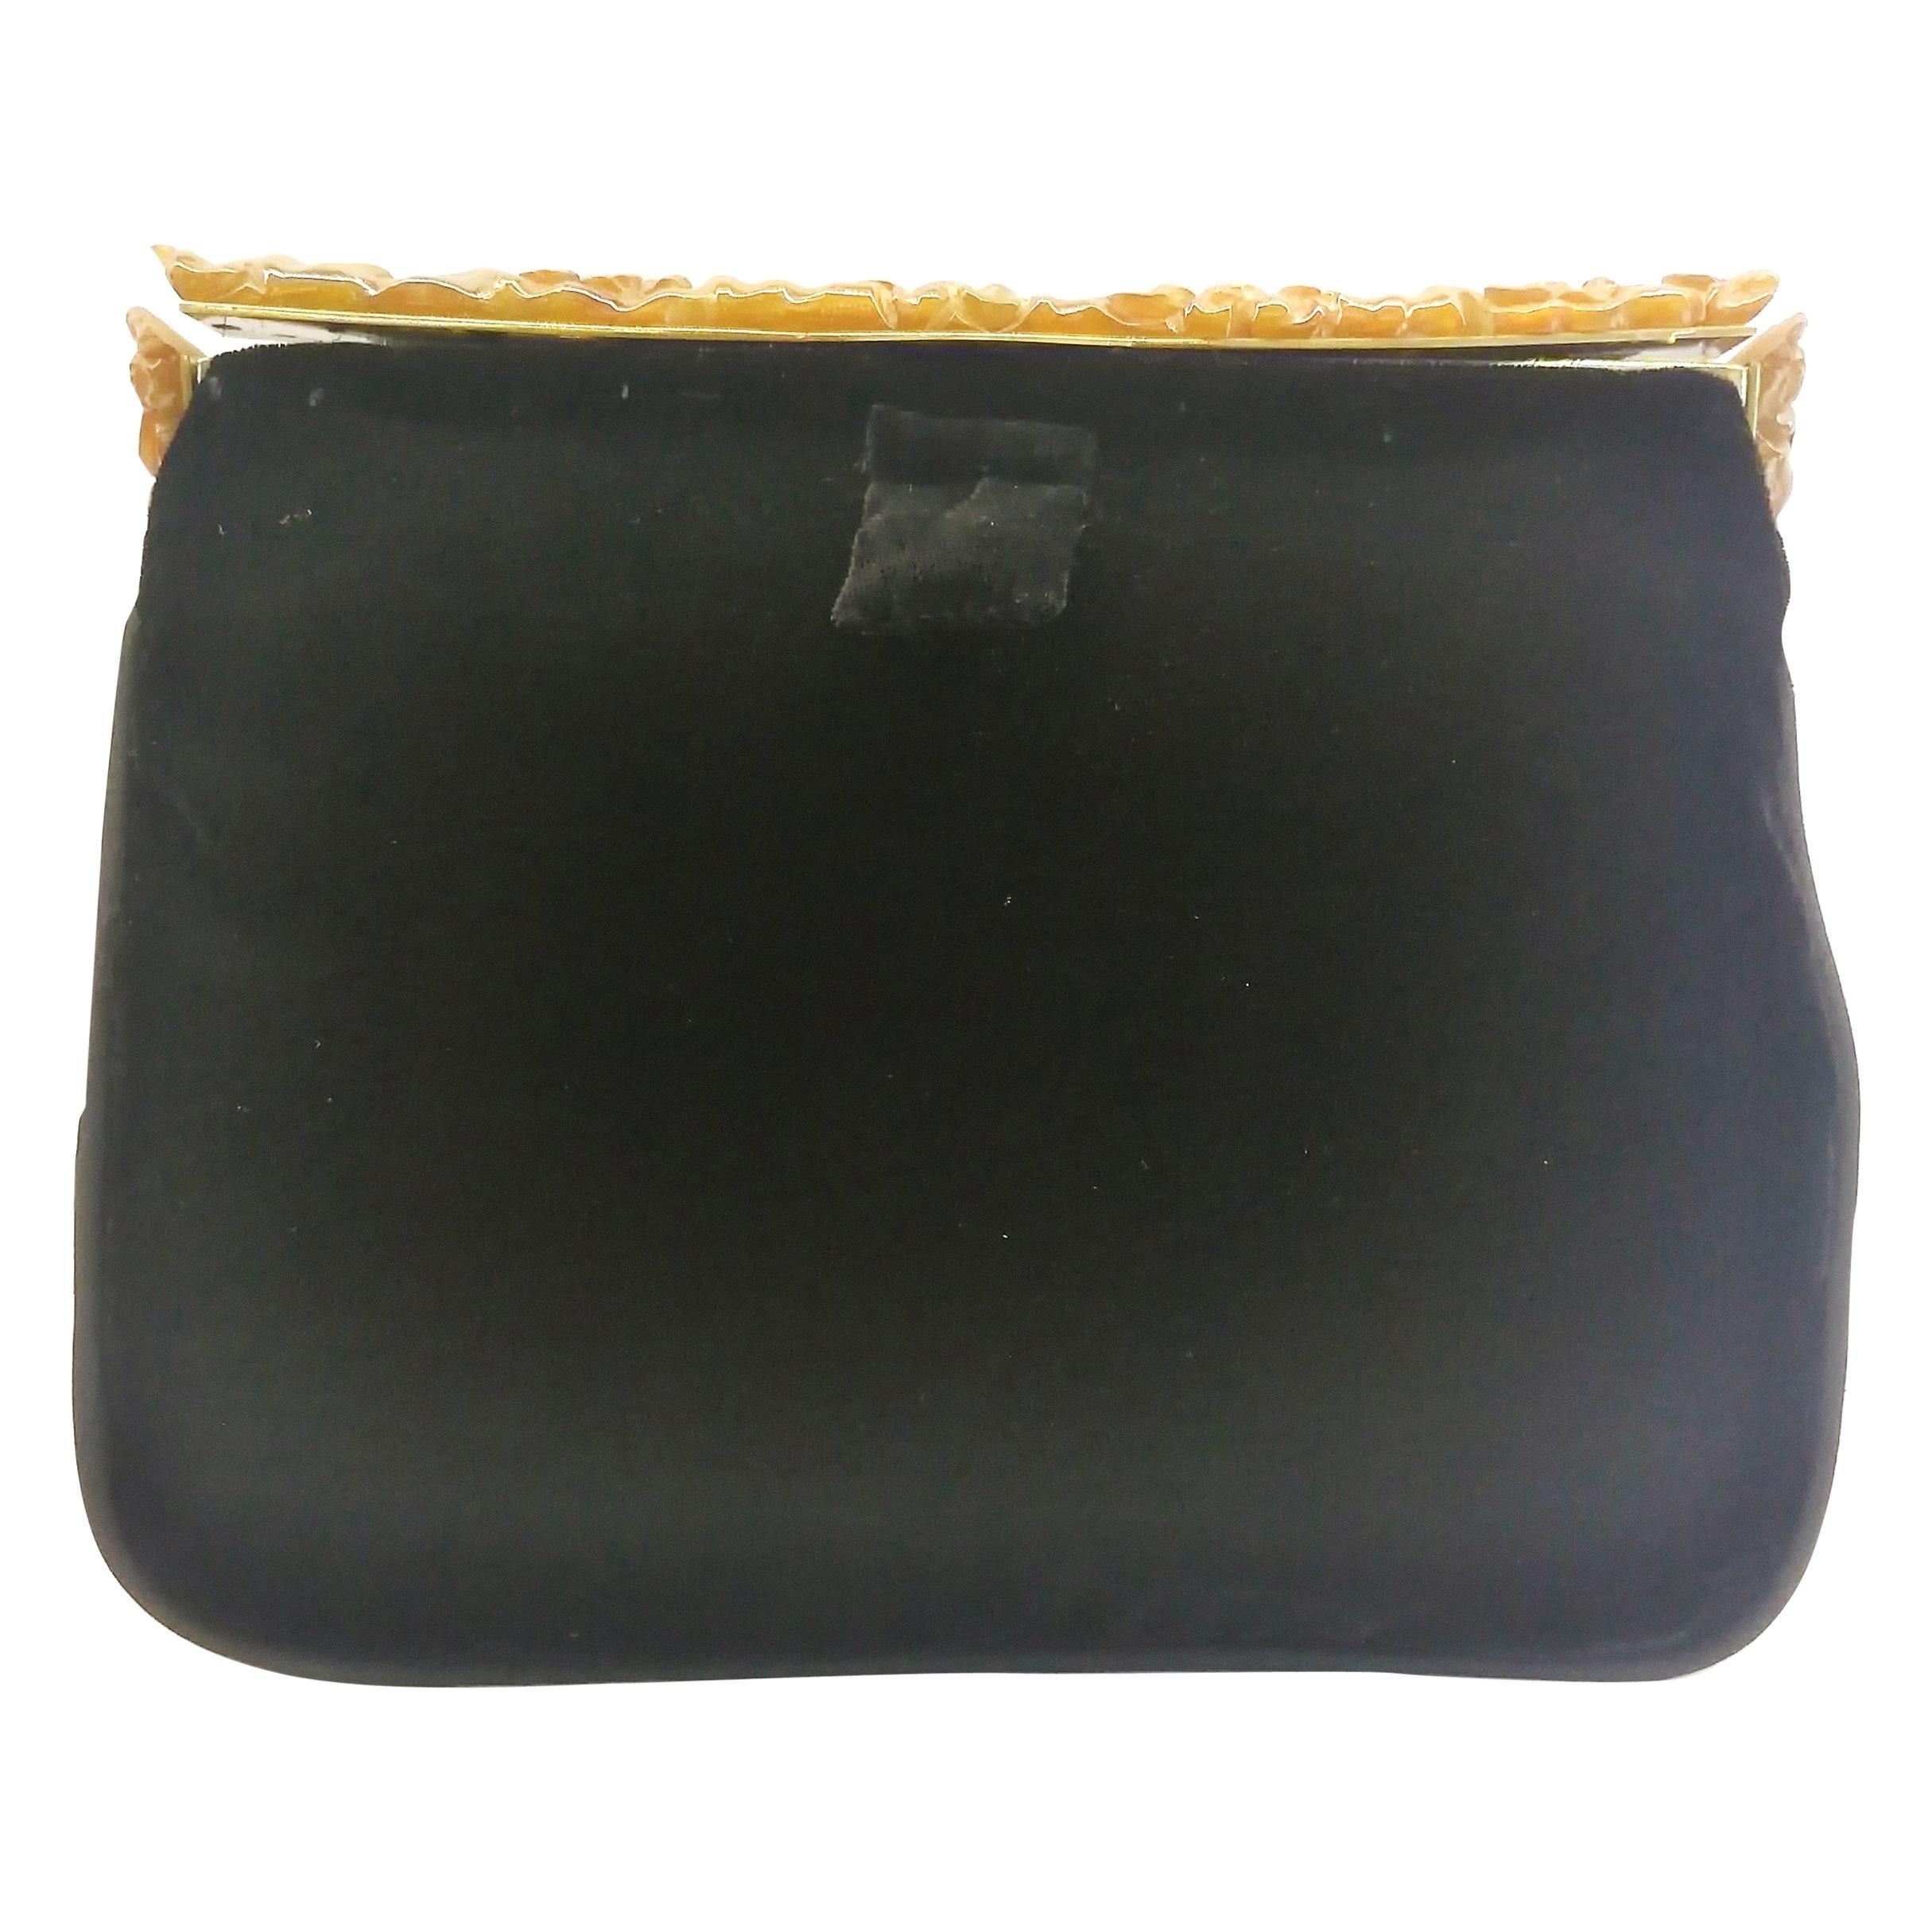 A carved amber Bakelite frame, and silk velvet clutch/handbag, 1930s.